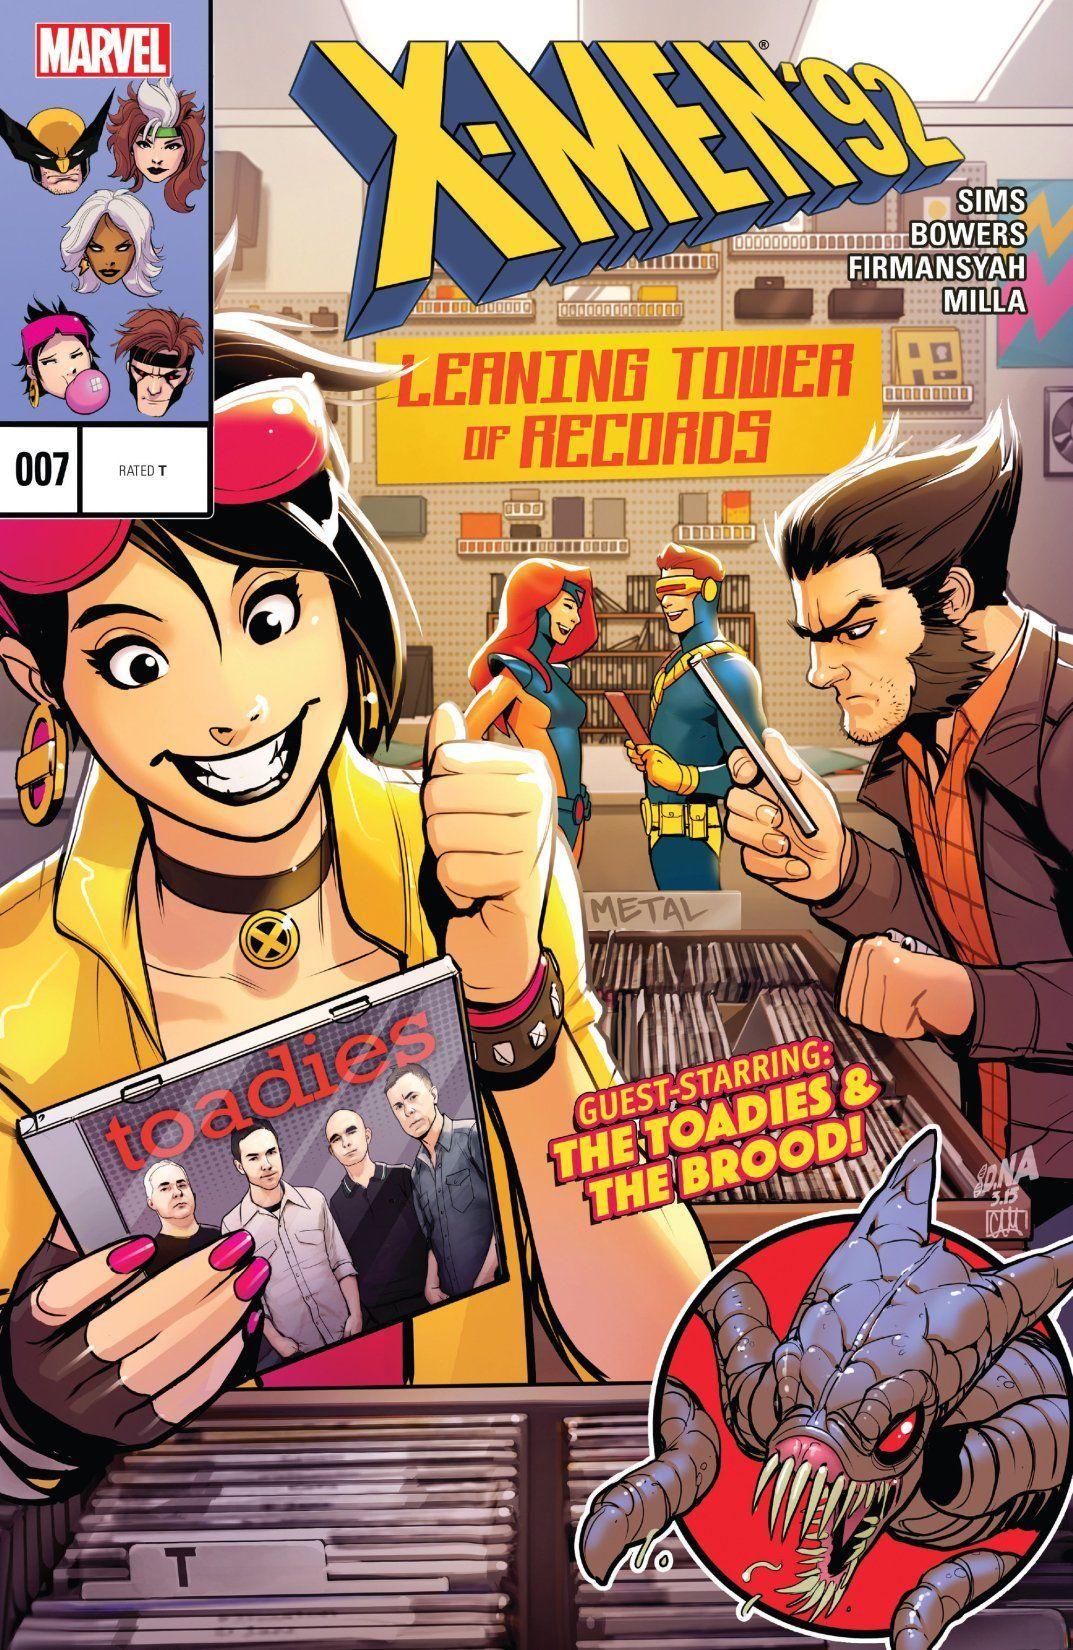 X Men 92 2016 7 Comics By Comixology X Men Marvel Comics Marvel